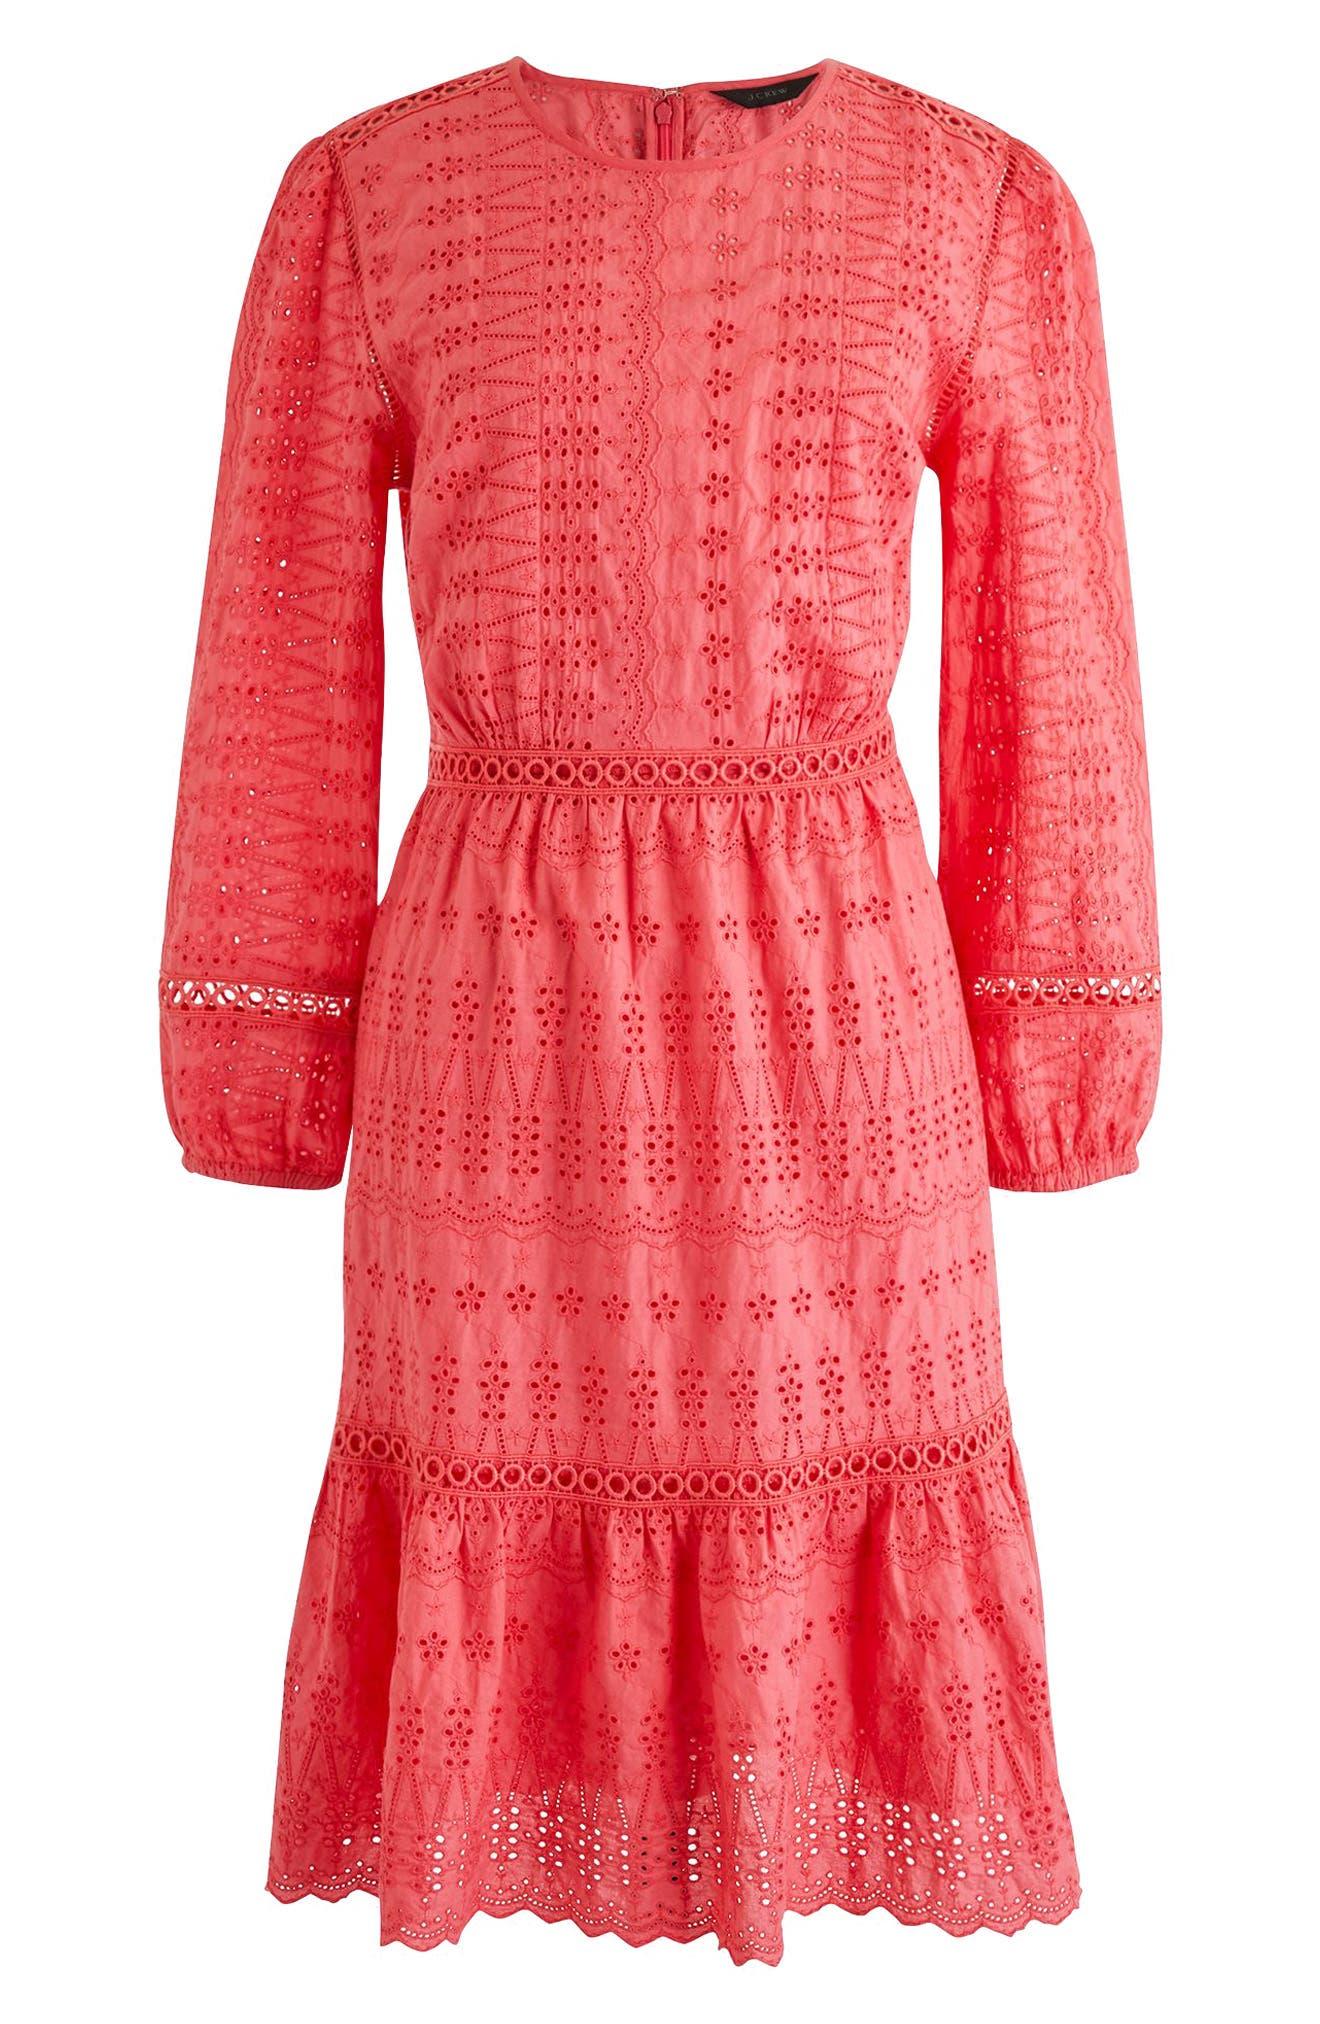 J.Crew Long Sleeve Embroidered Dress (Regular & Petite)